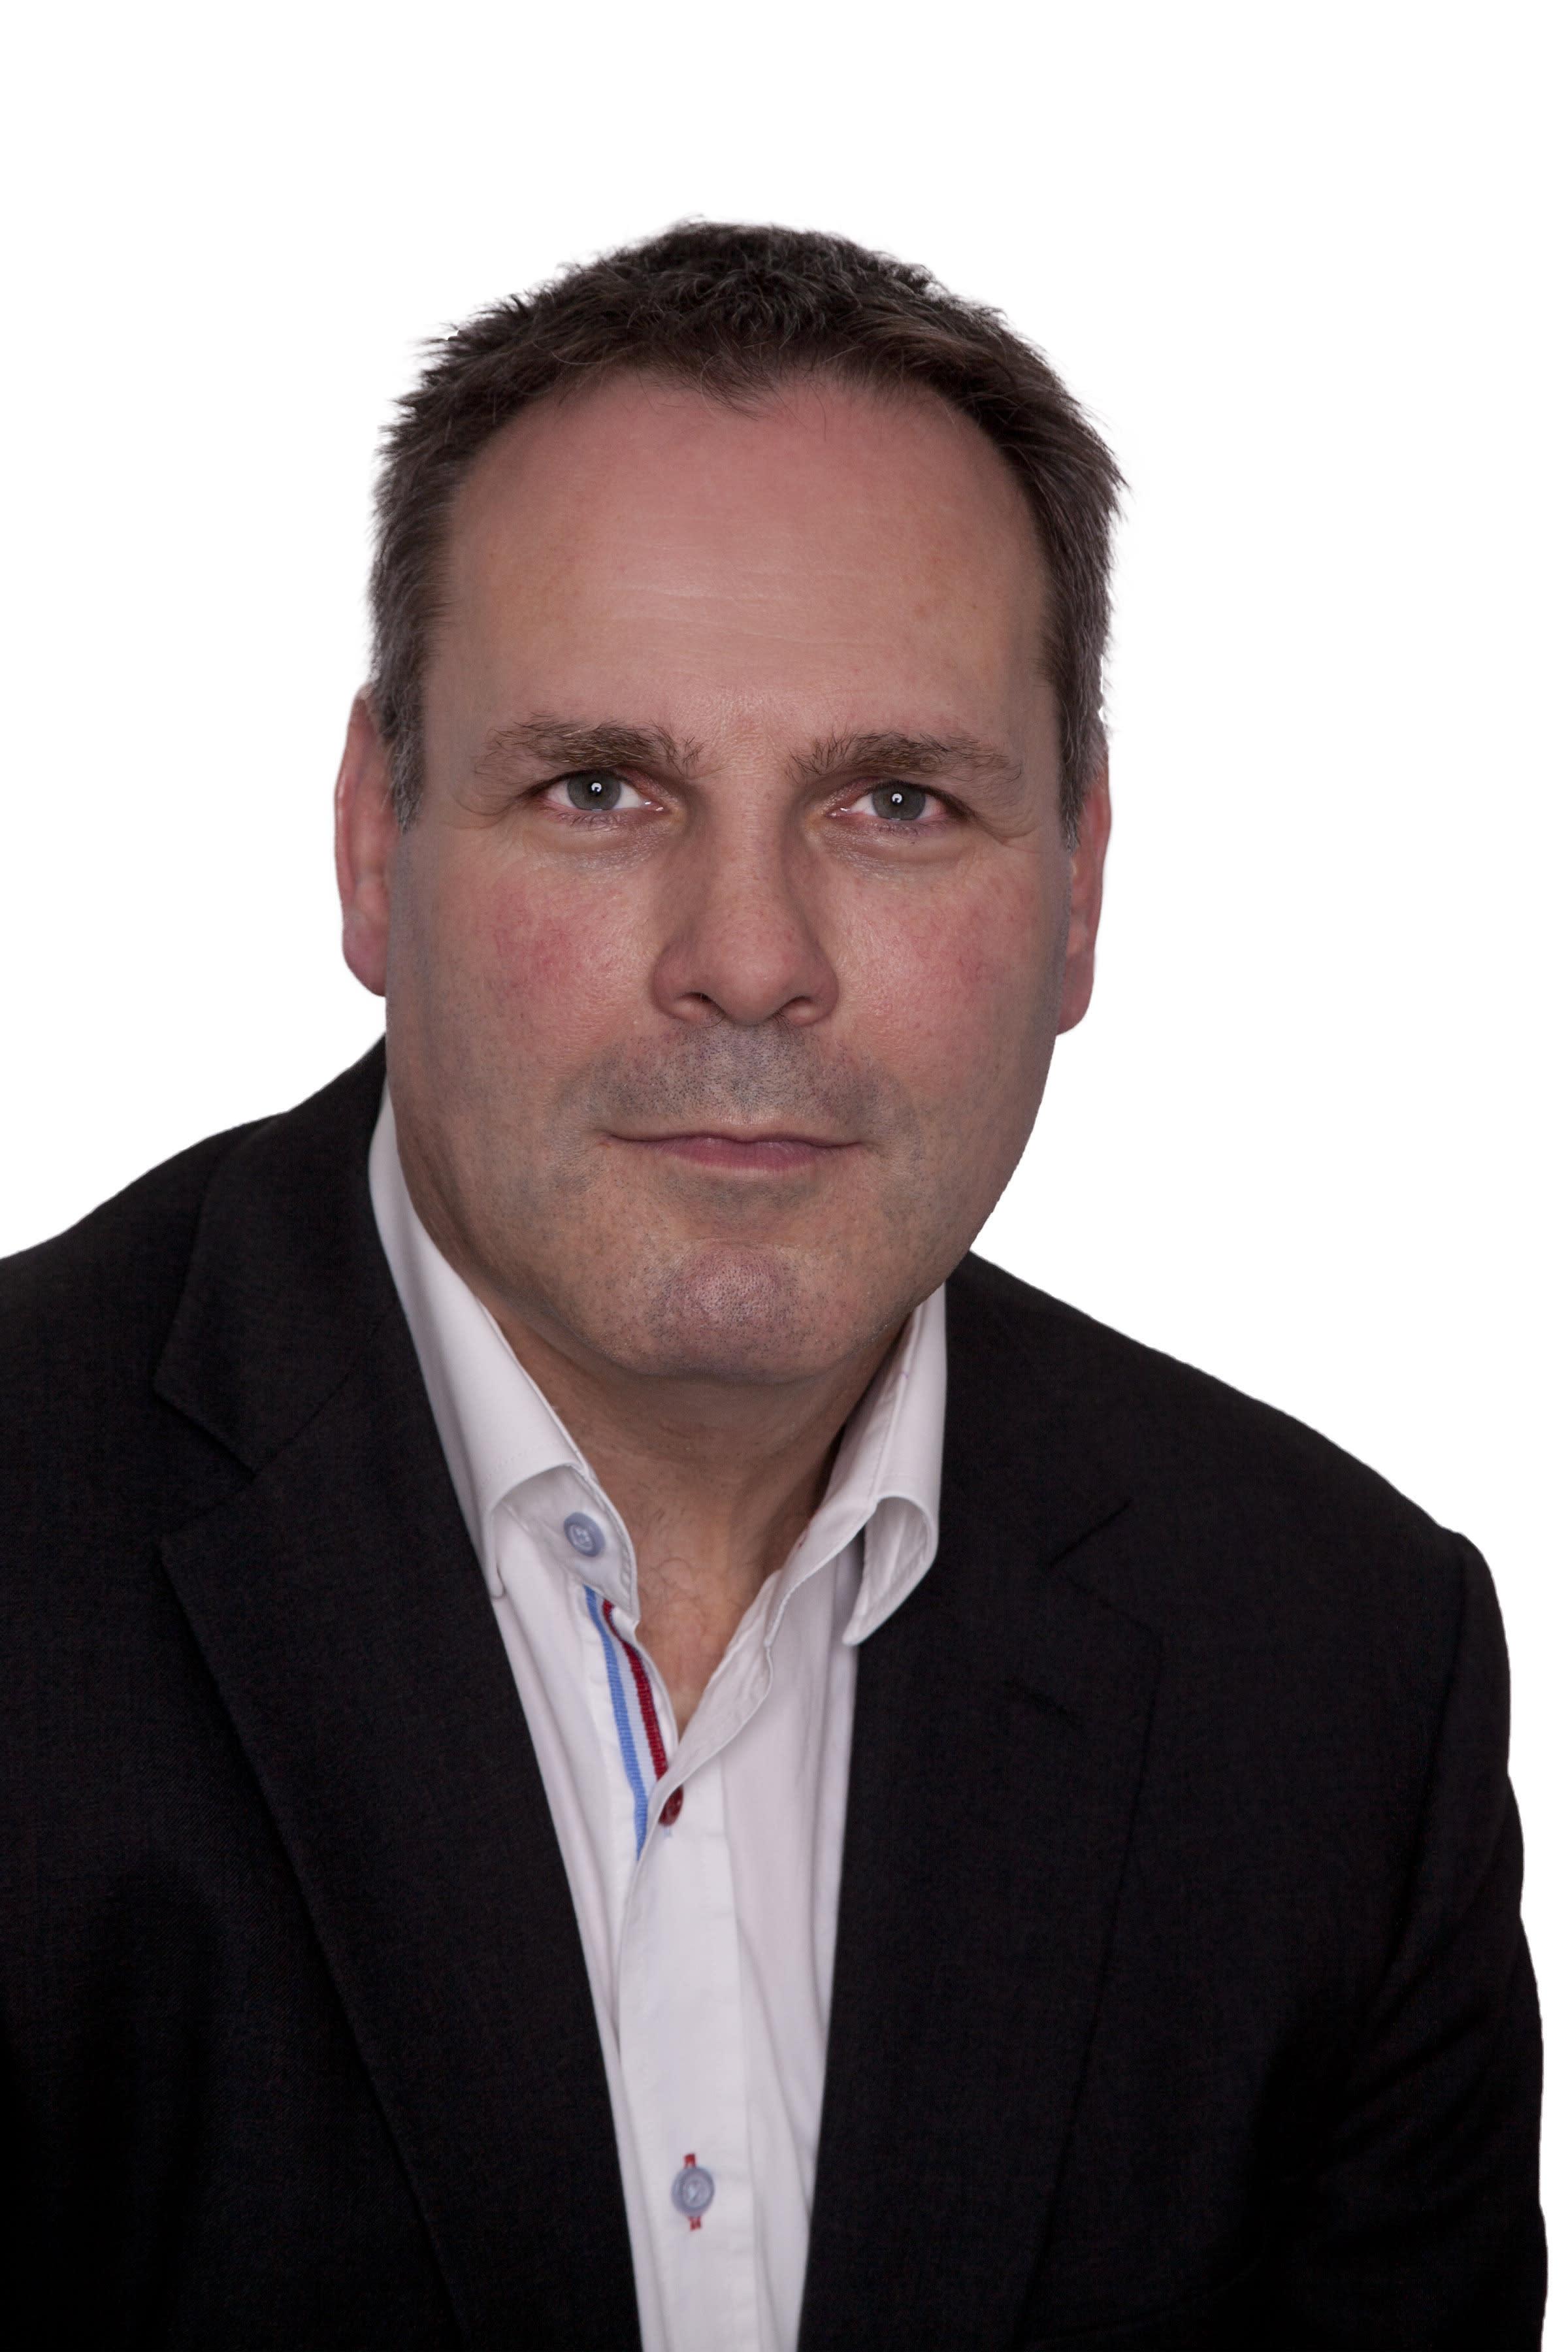 HighRadius Accelerates EMEA Expansion by Adding Fintech Veteran